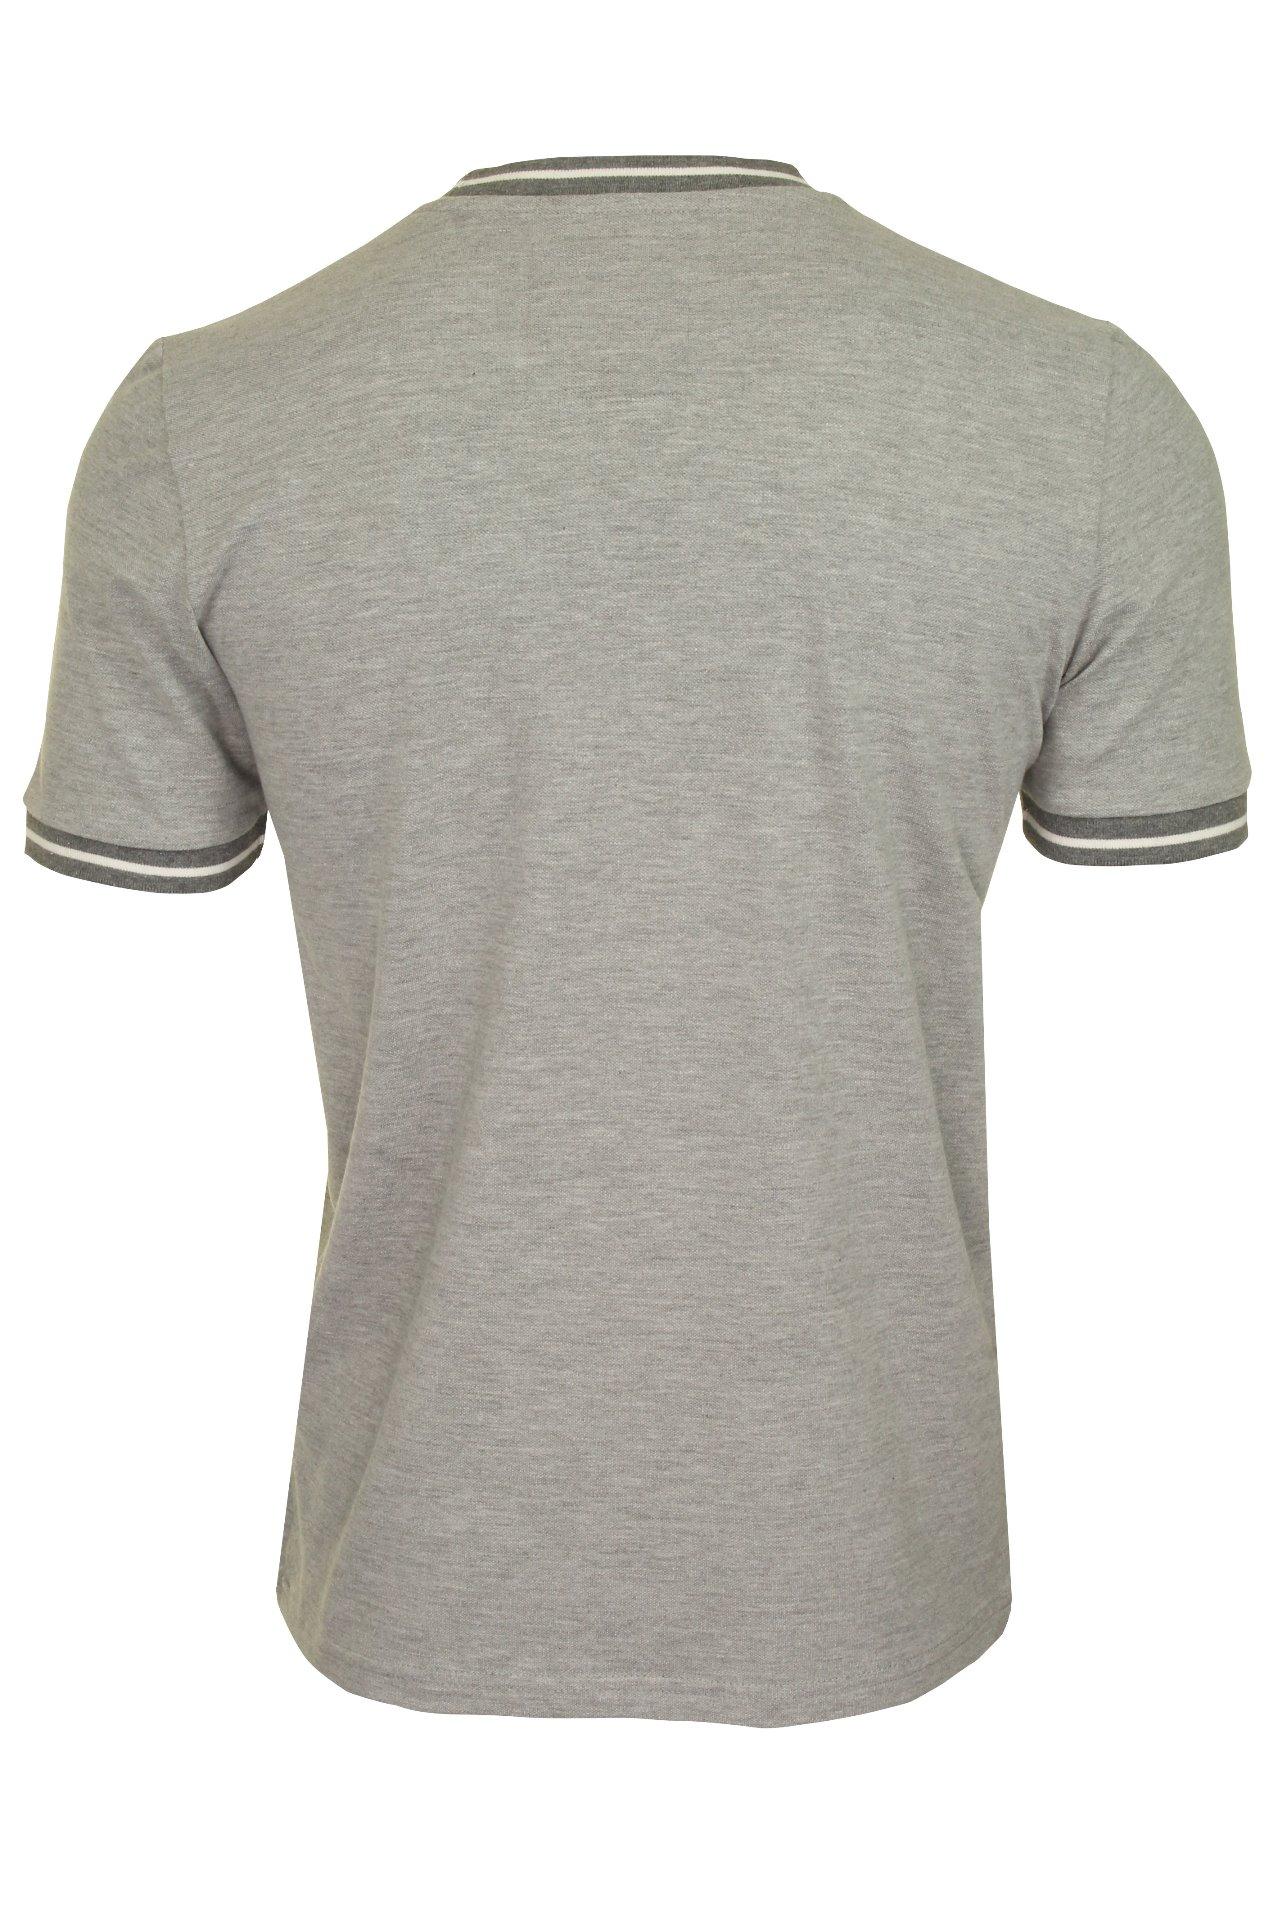 Tokyo-Laundry-Mens-Pique-Crew-Neck-T-Shirt-039-Wentworth-039 thumbnail 5